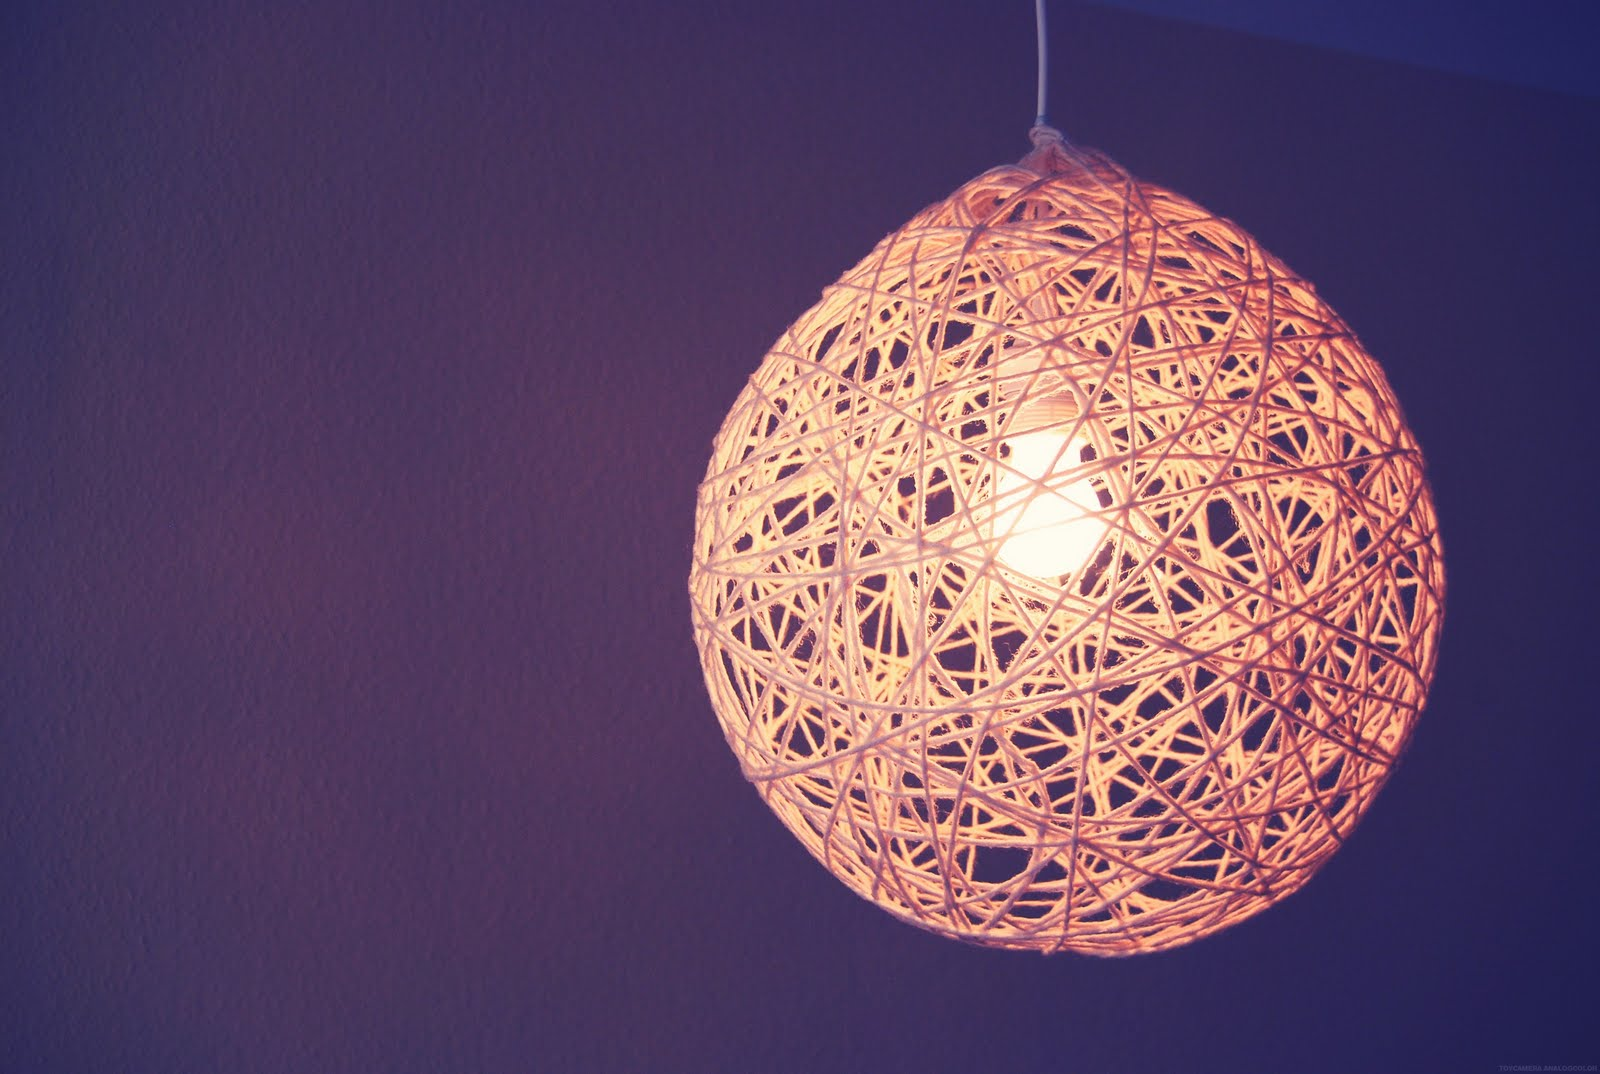 lampenschirm basteln luftballon. Black Bedroom Furniture Sets. Home Design Ideas